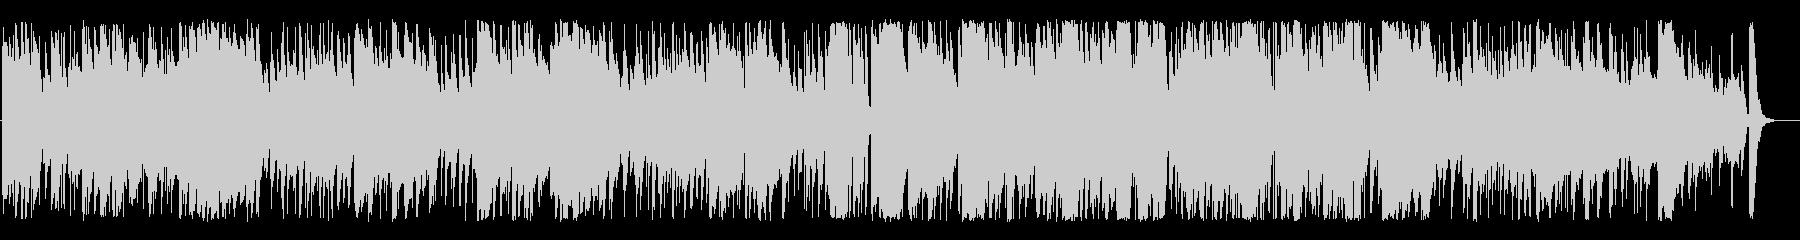 Twinkle star (sax)'s unreproduced waveform